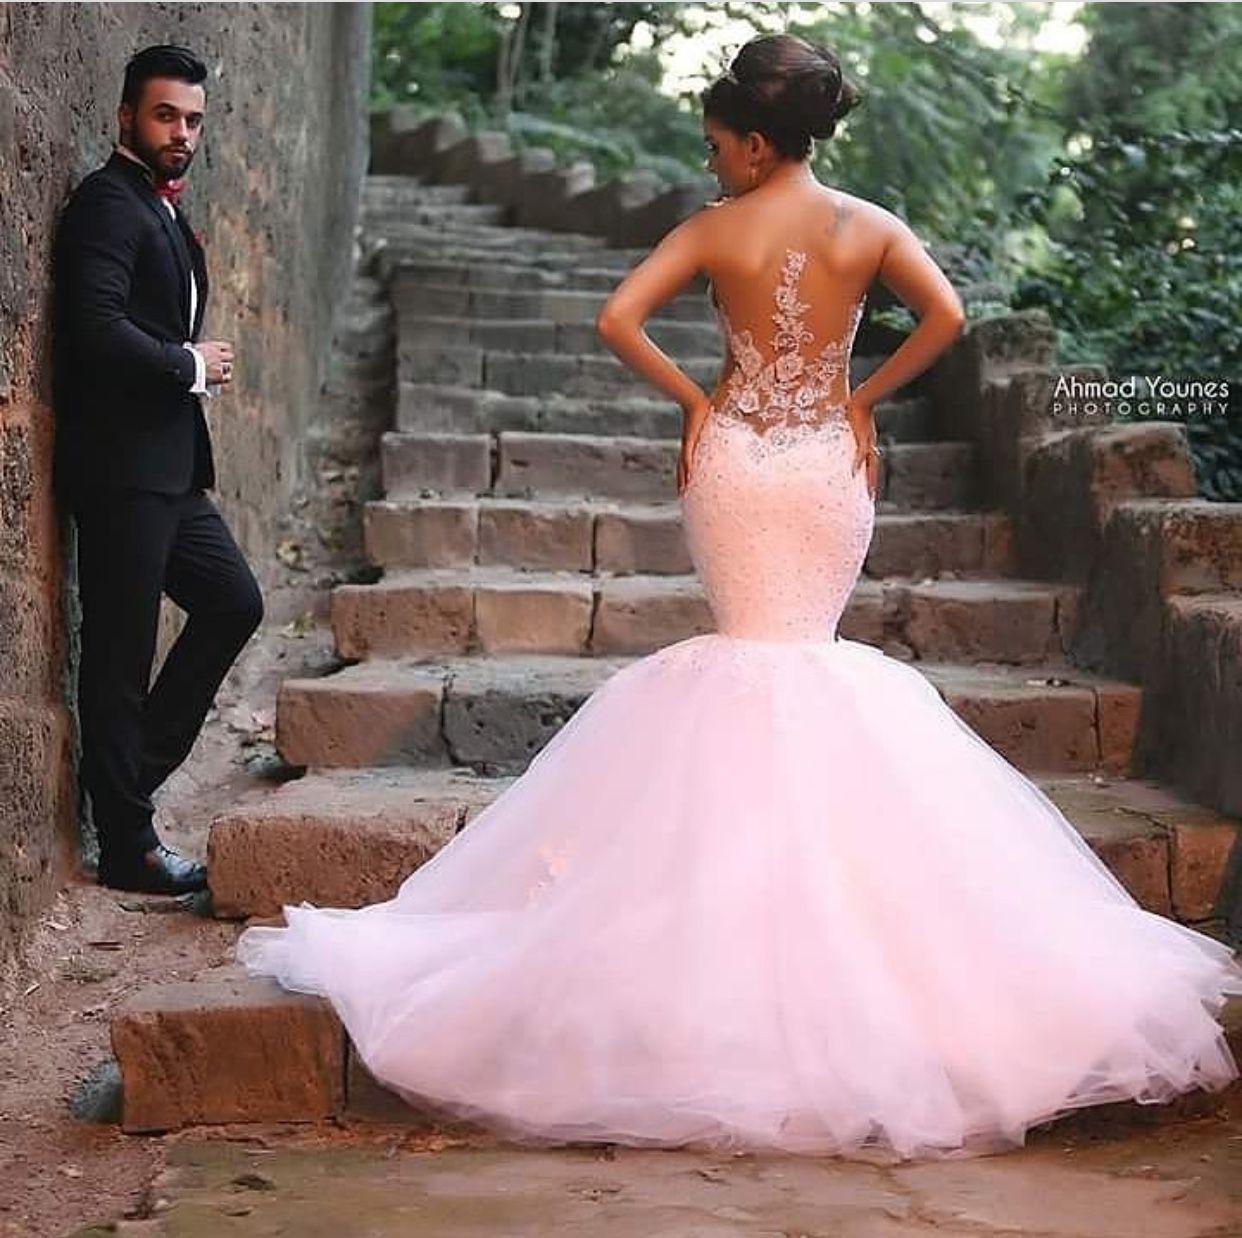 Pin de nevenka en Wedding dress | Pinterest | Vestidos de novia, De ...